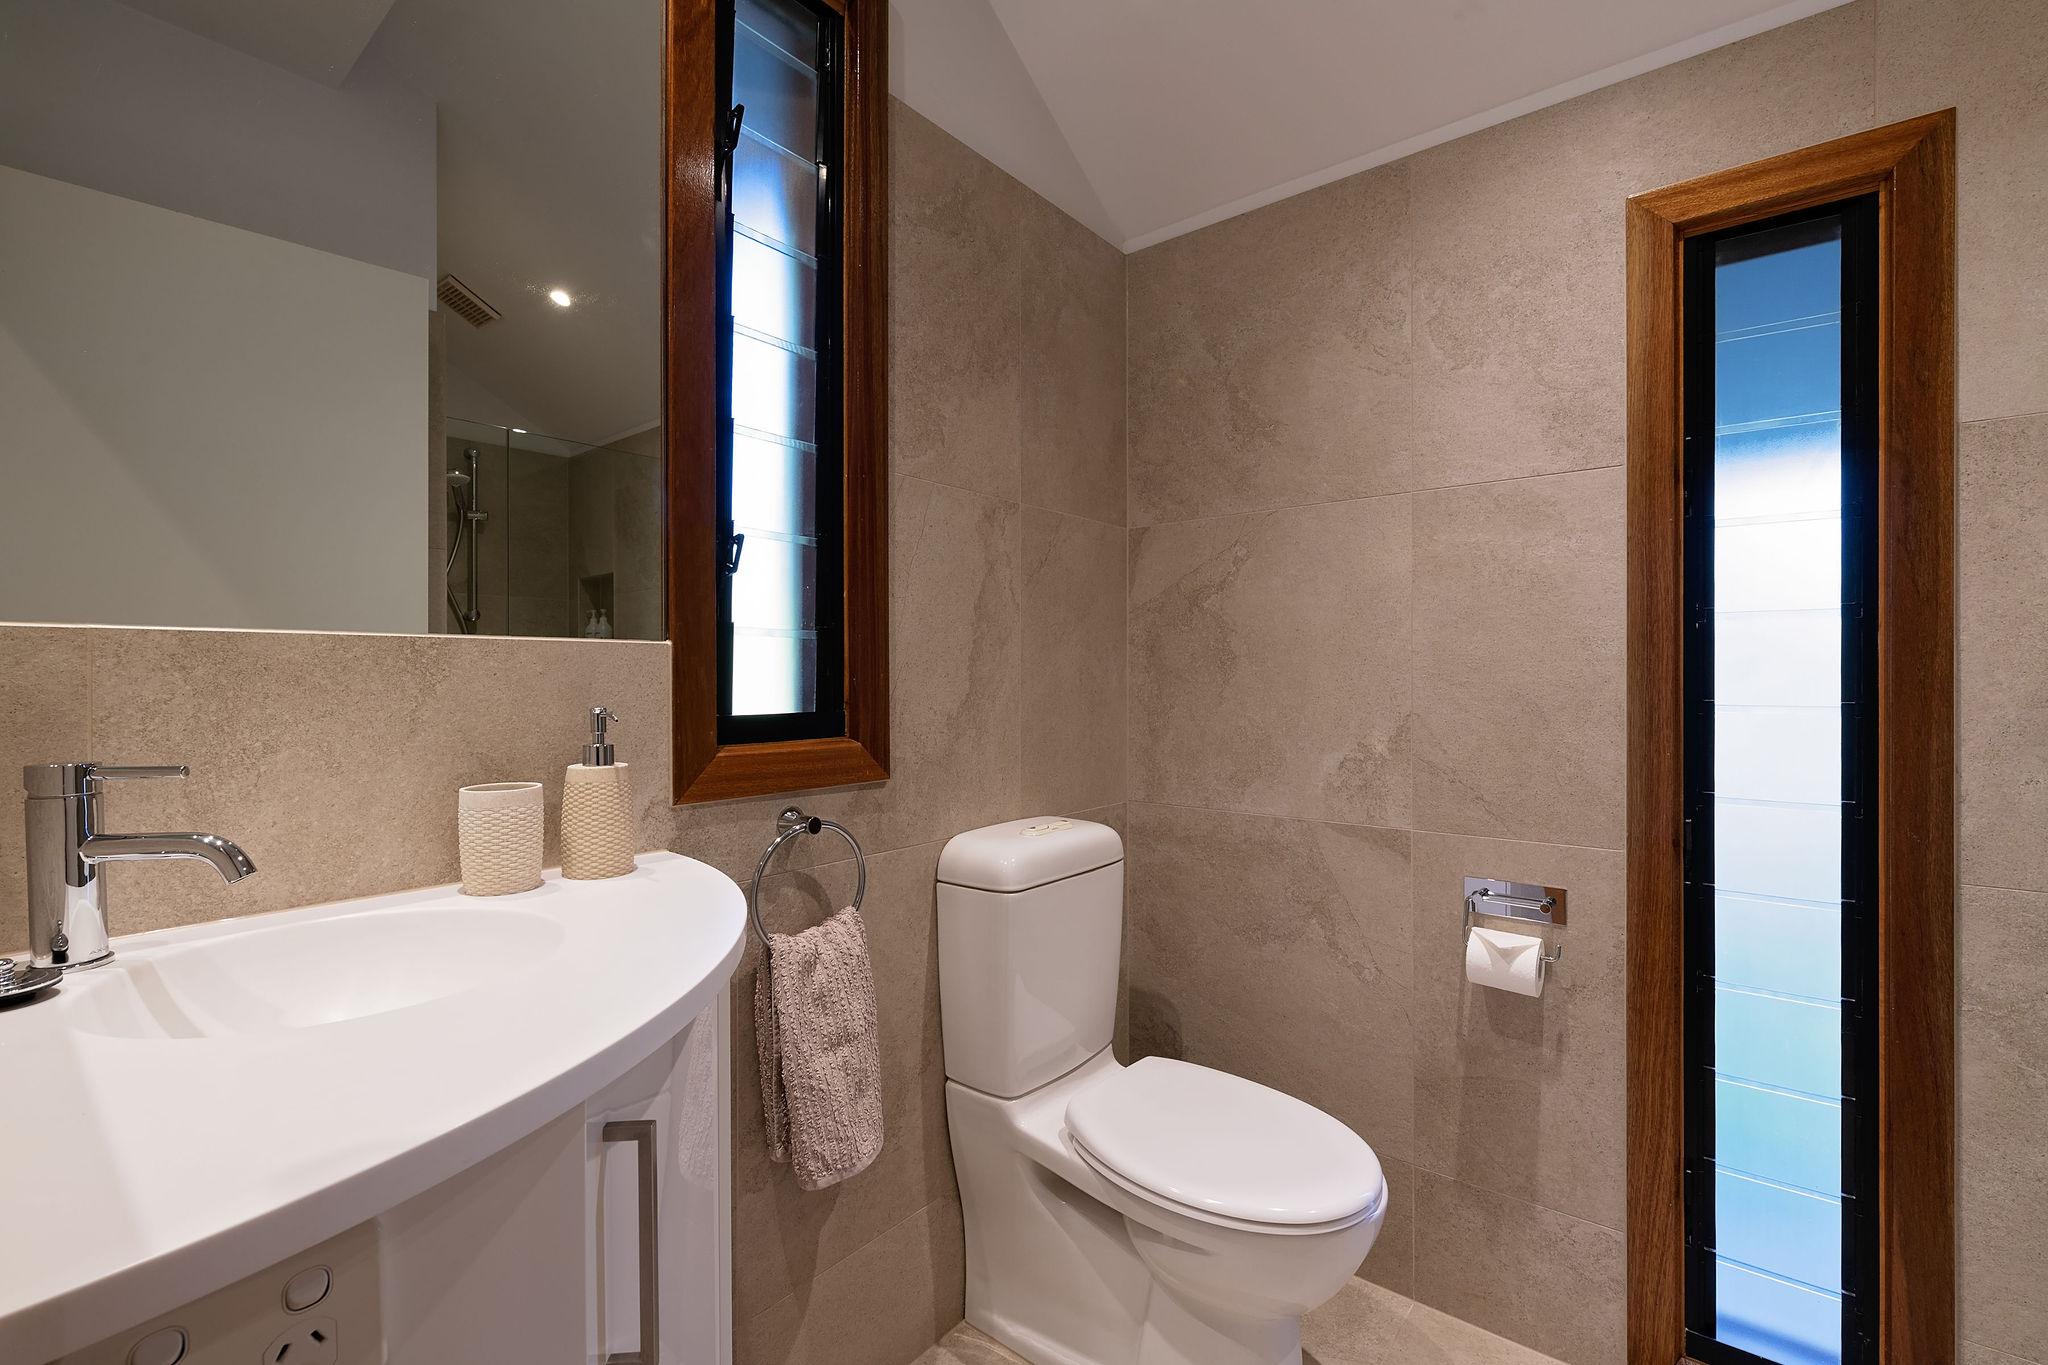 Gums bathroom